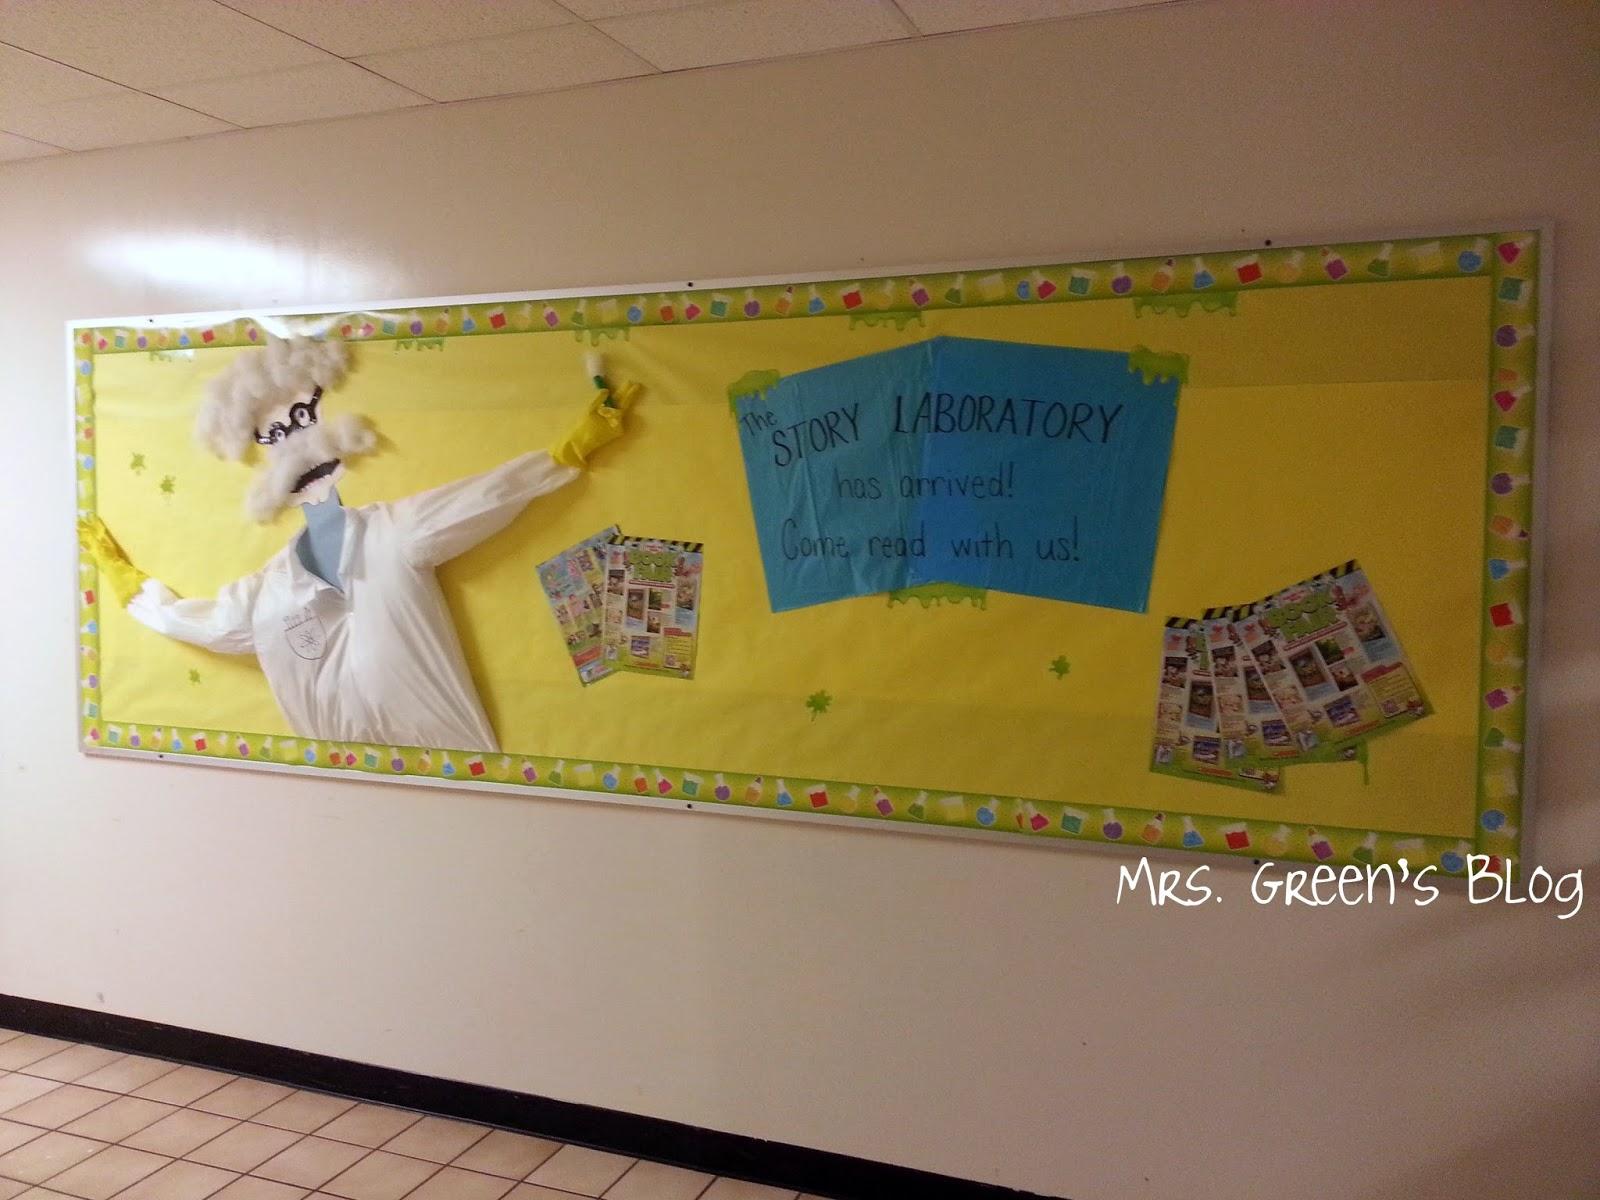 Mrs. Green\'s Blog: Book Fair: Story Laboratory science lab